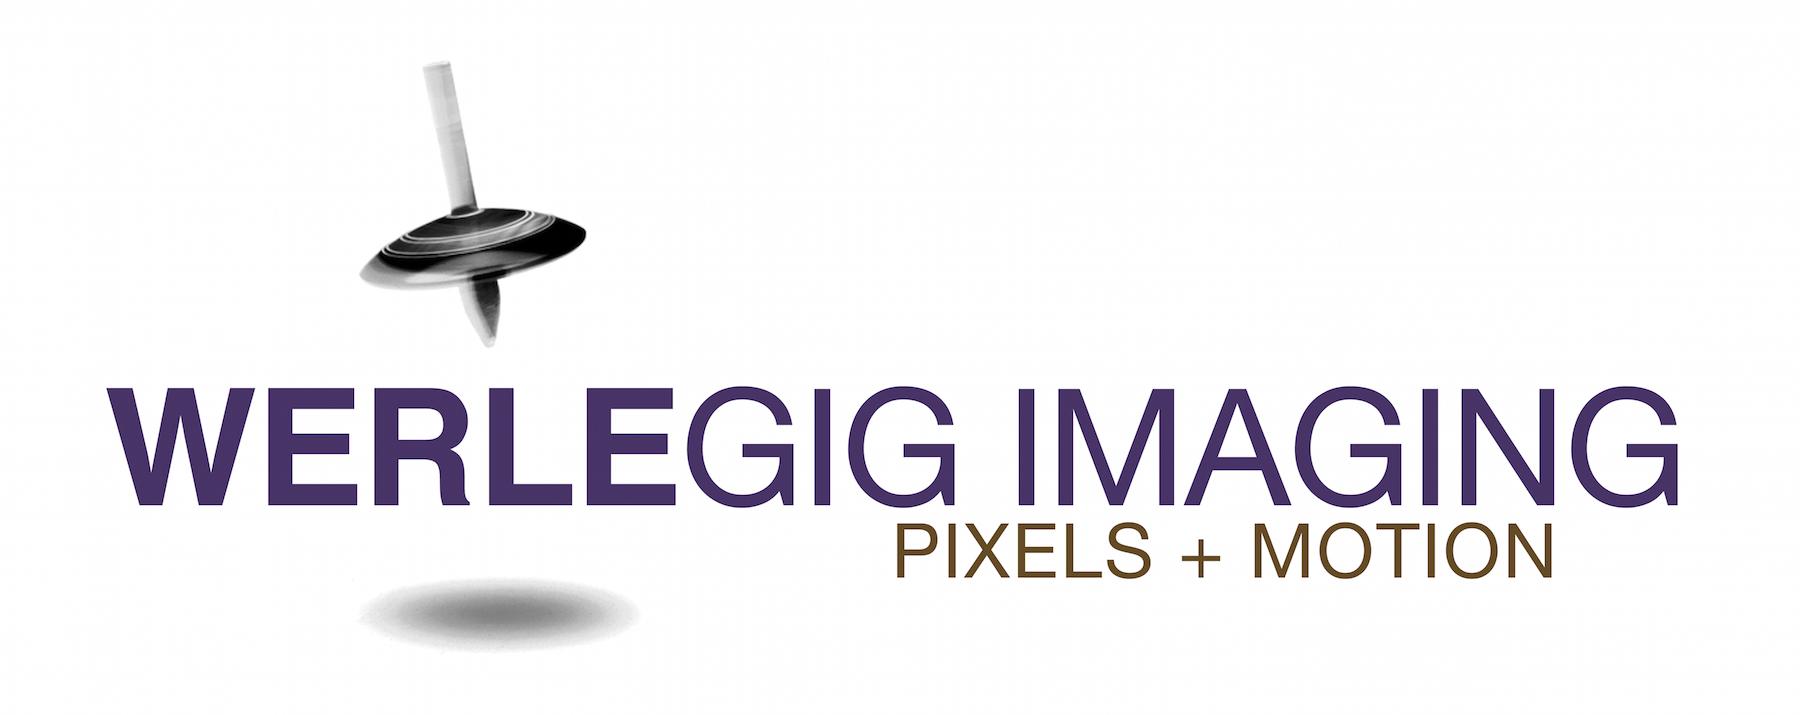 Werlegig Imaging Pixels & Motion Logo